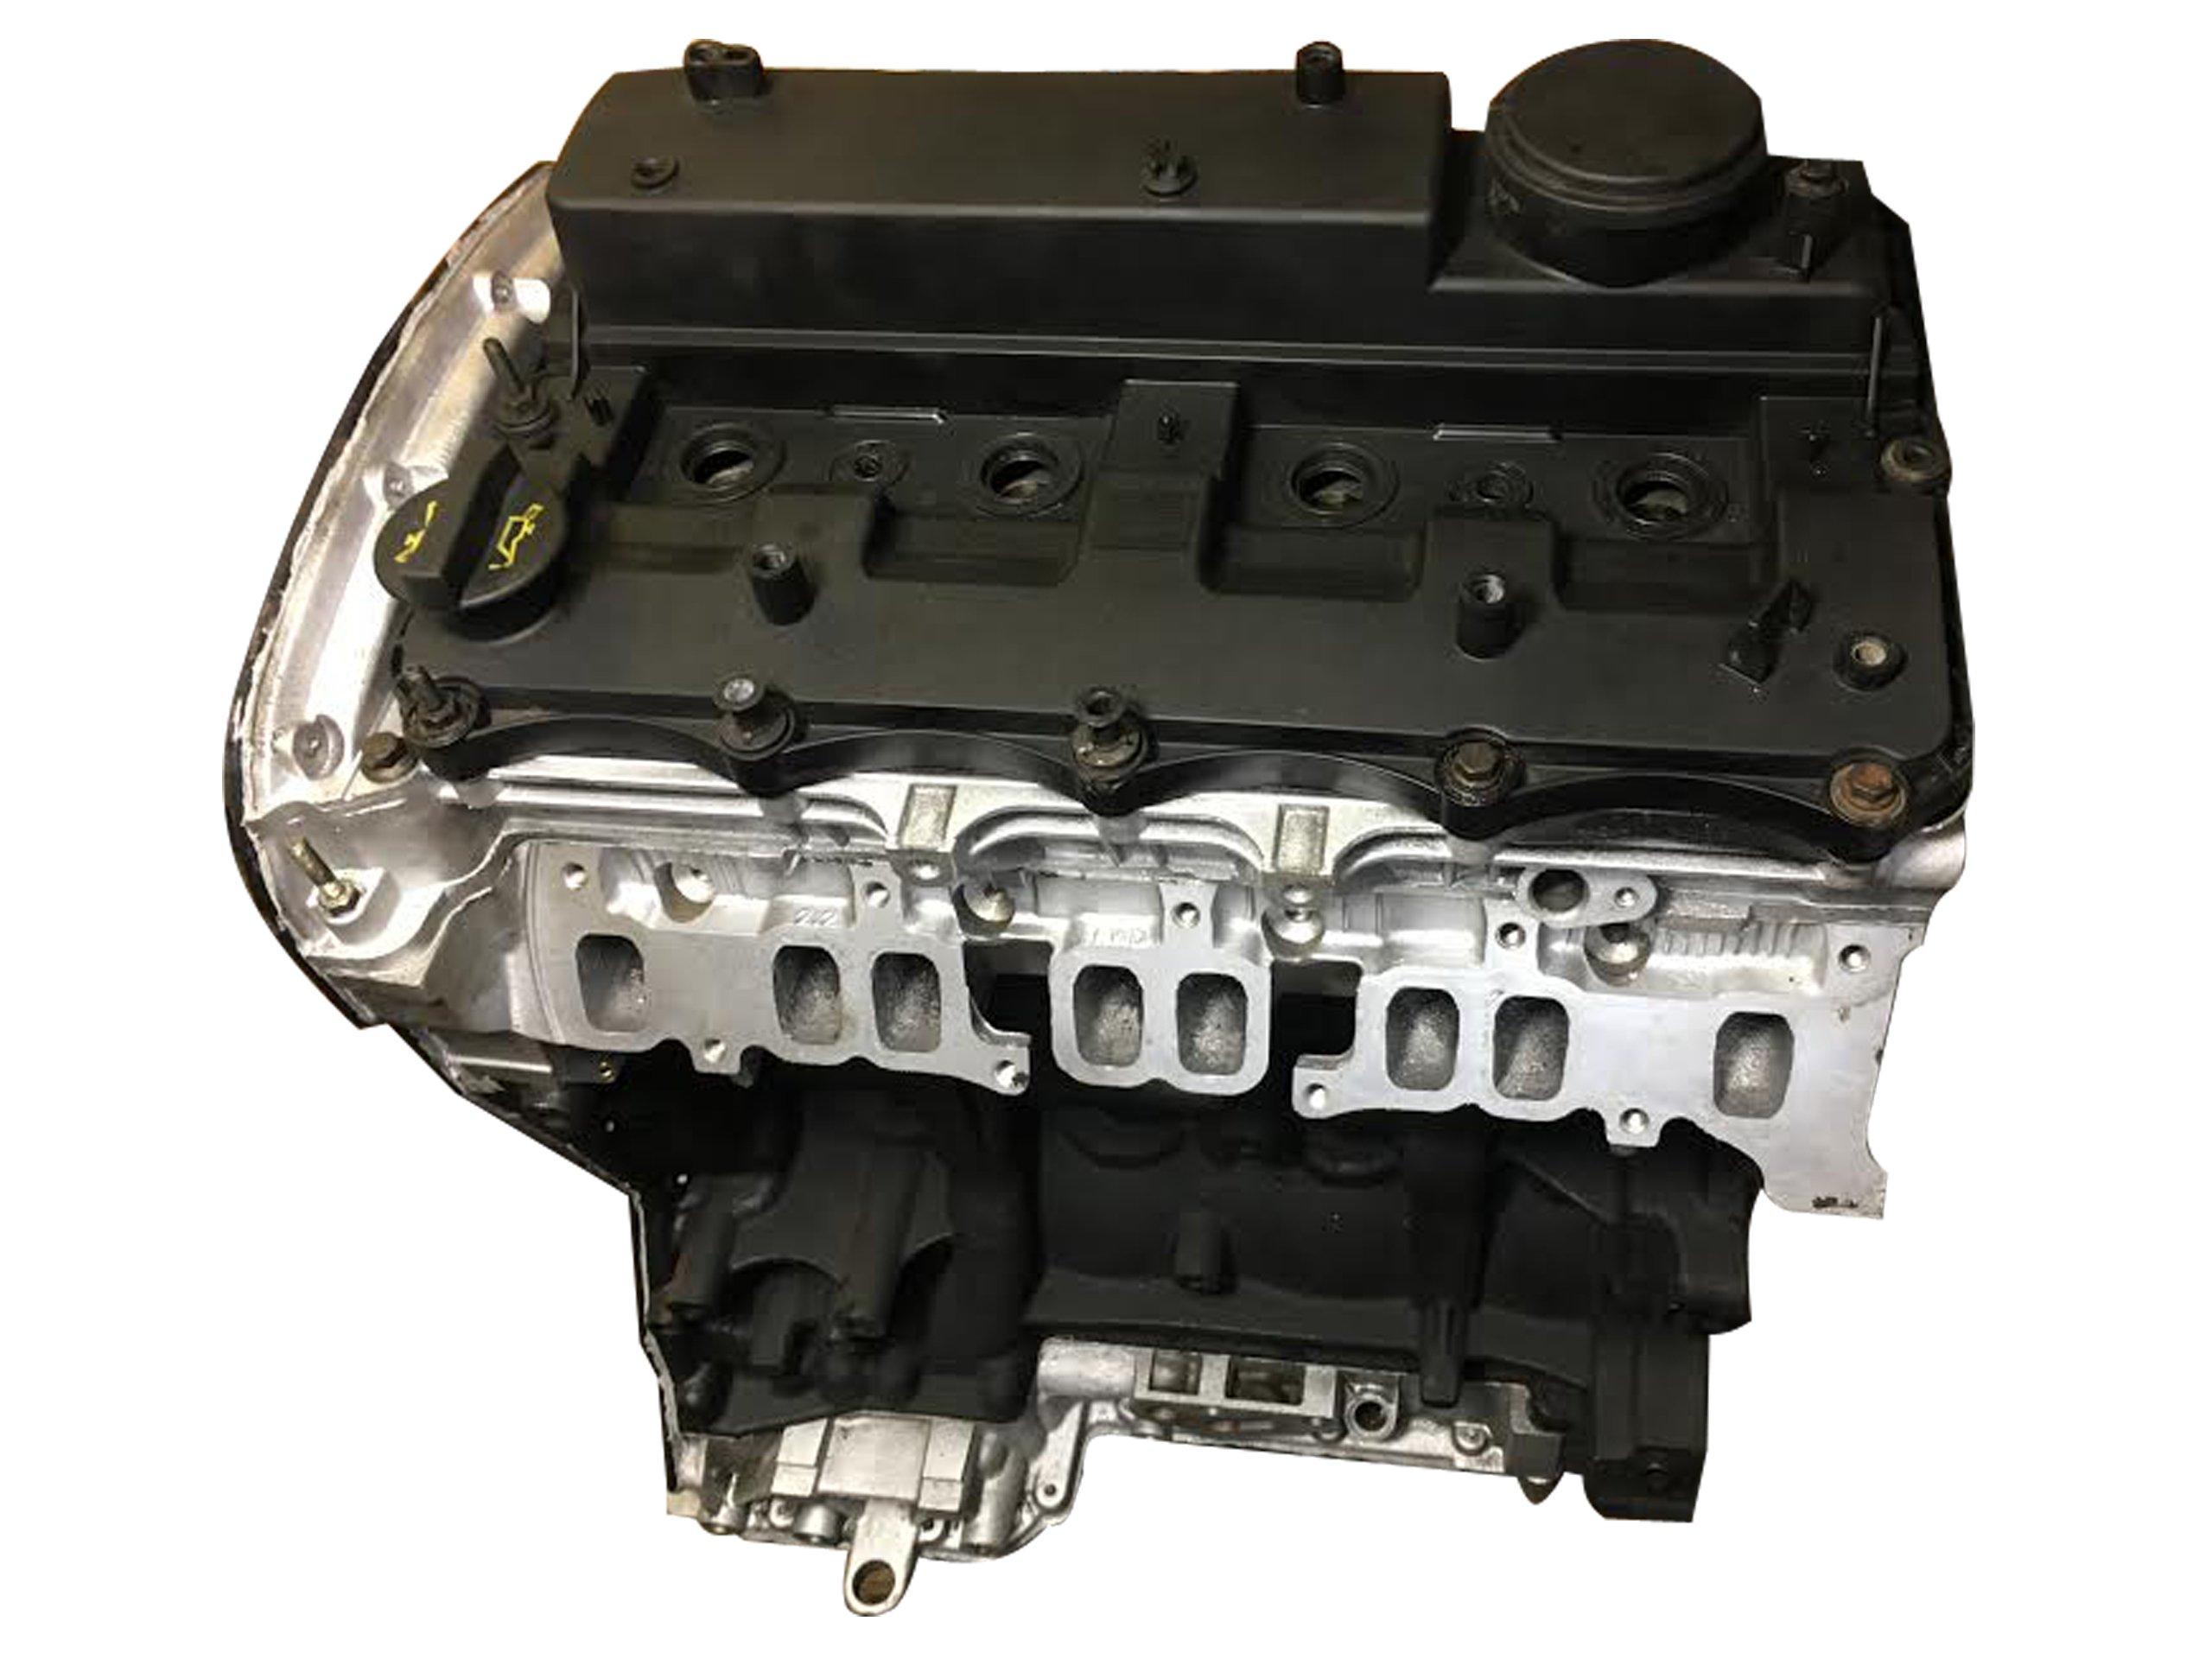 ford transit fiat ducato 22 tdci анекдоты двигатель motor